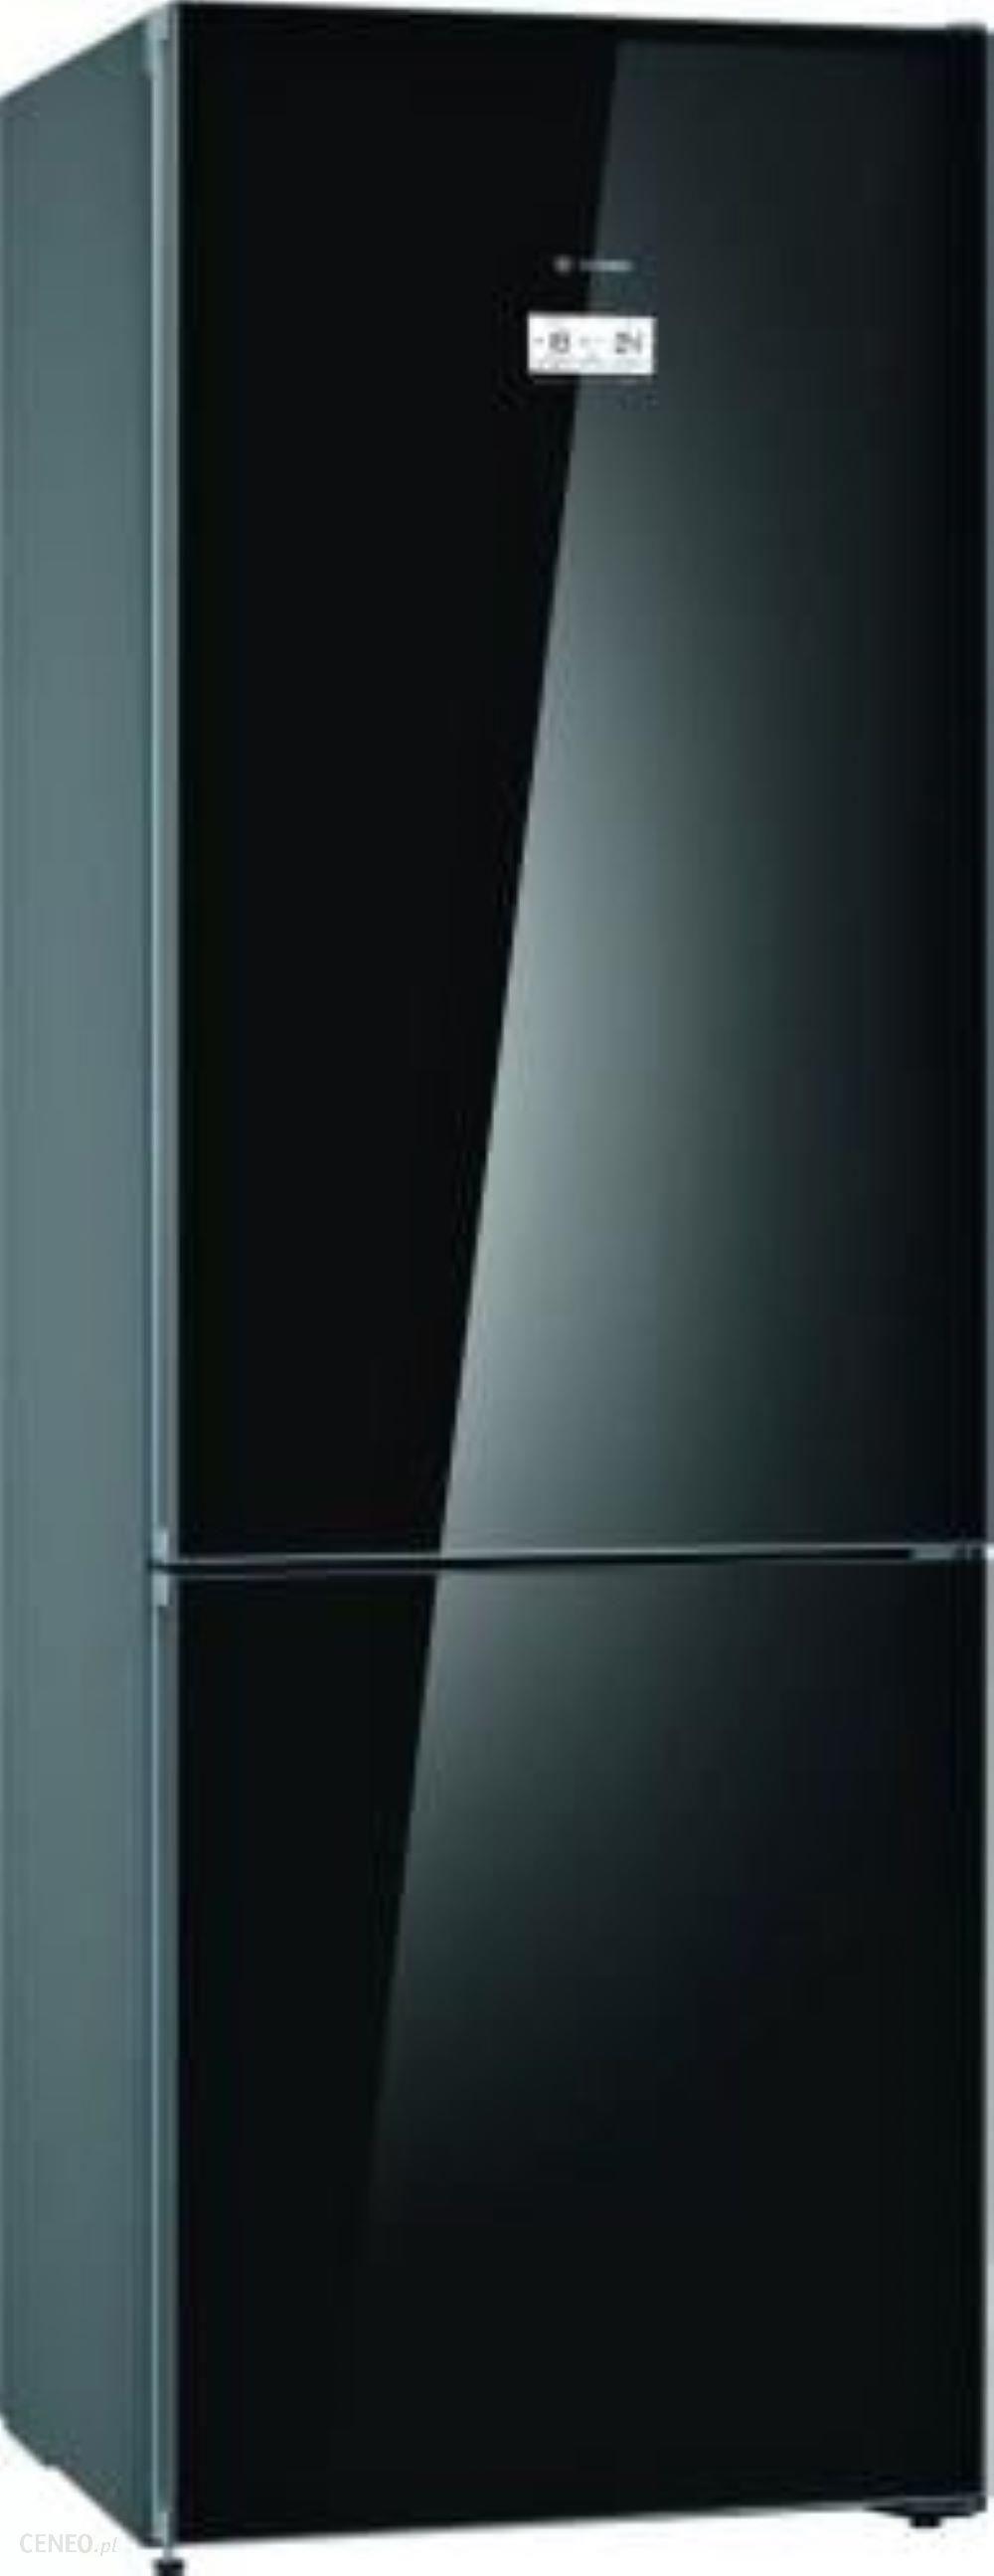 Bosch KGN49LBEA šaldytuvas